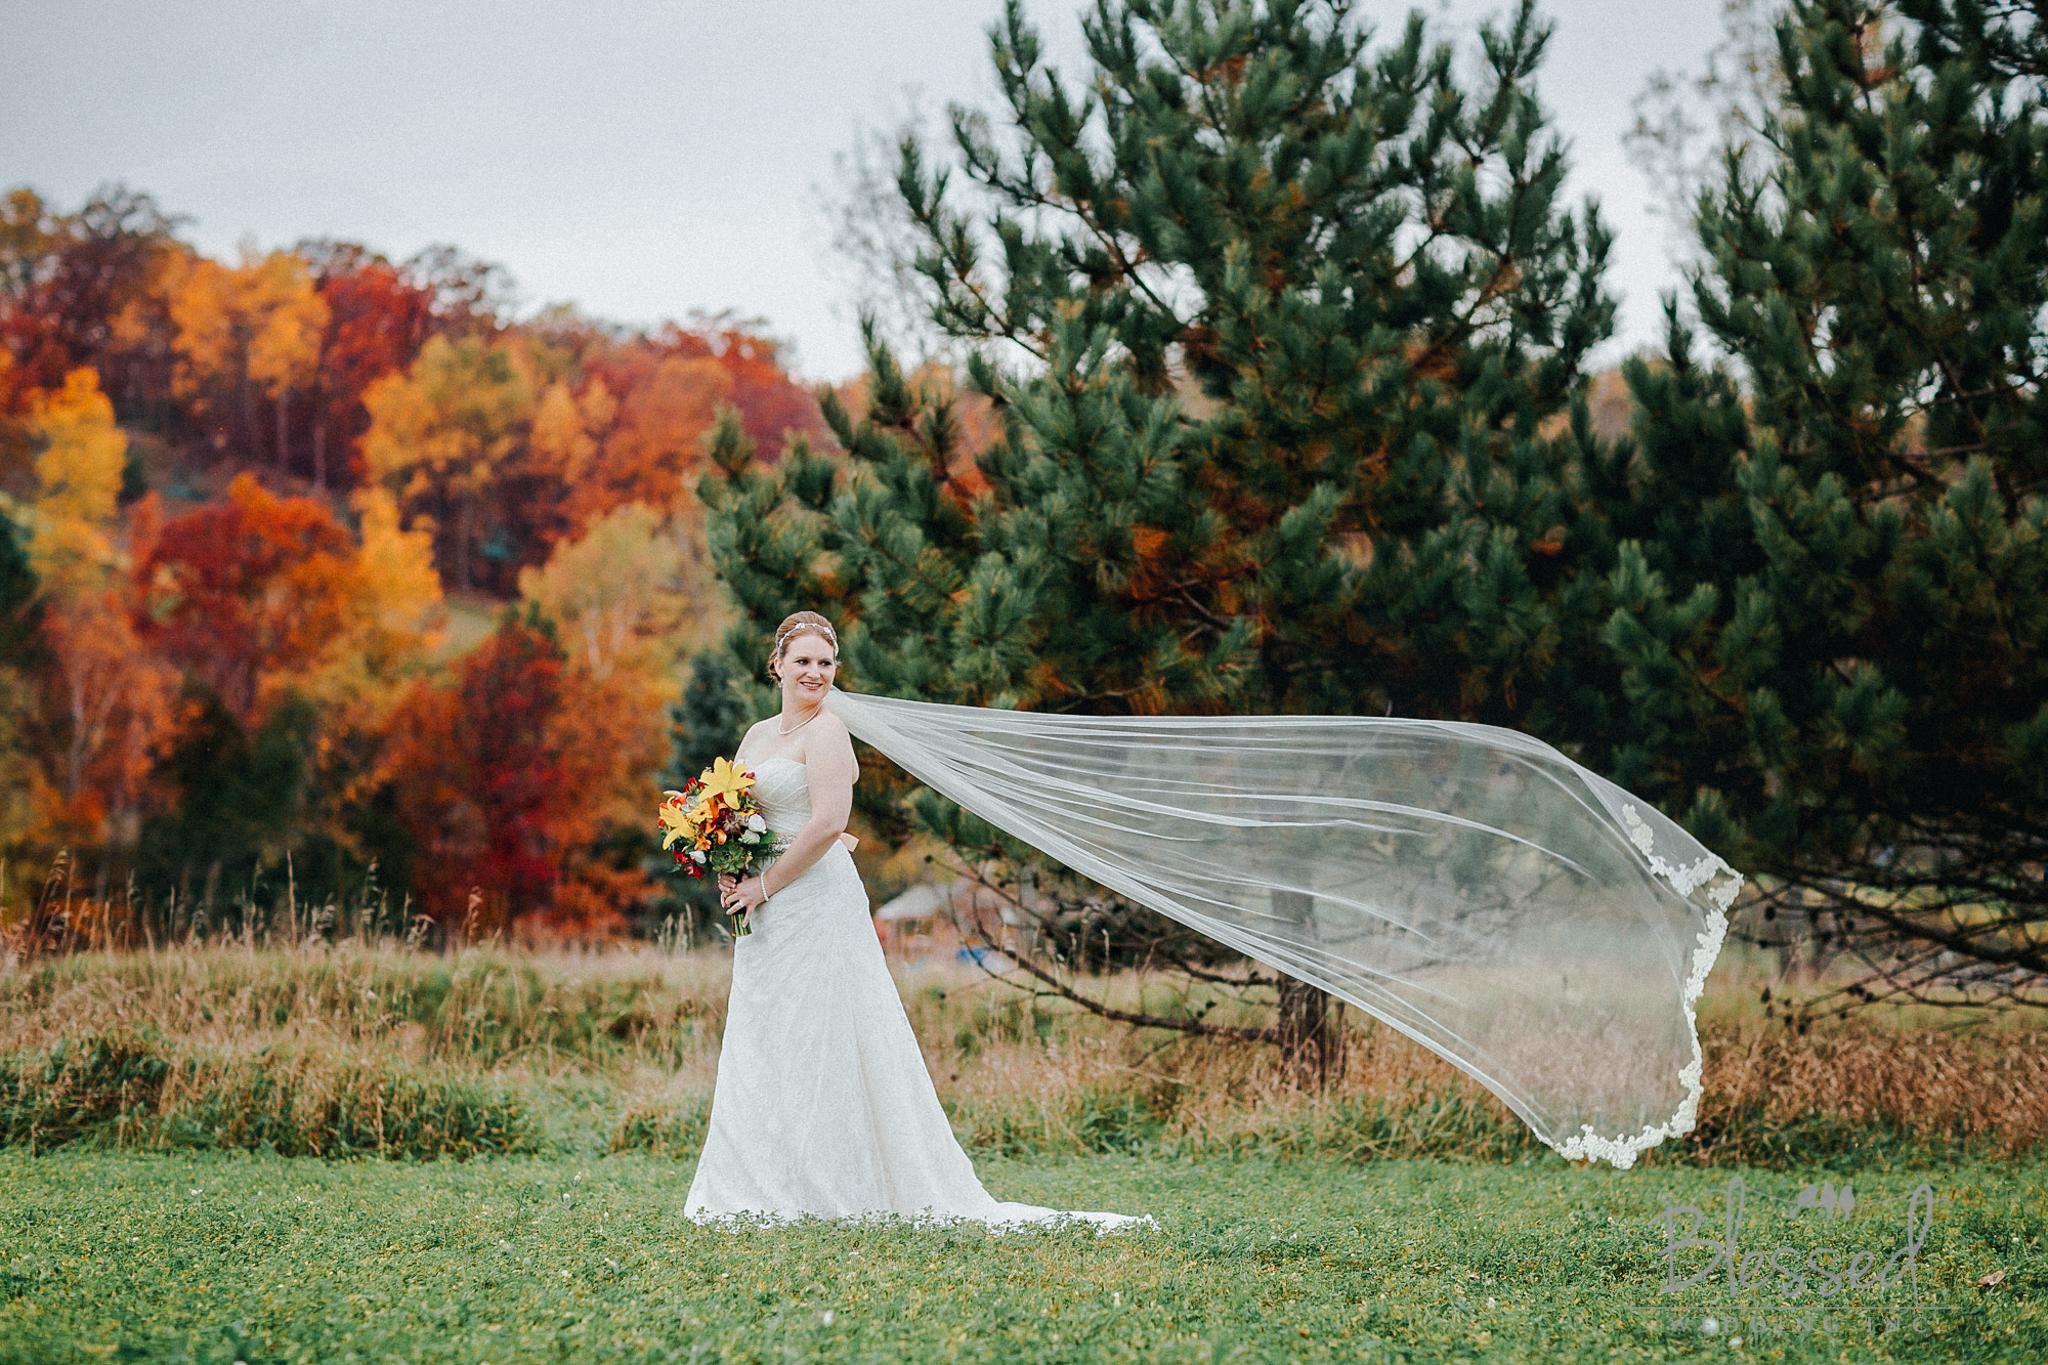 Destination Wedding Photography Minnesota By Blessed Wedding Photographers-51.jpg